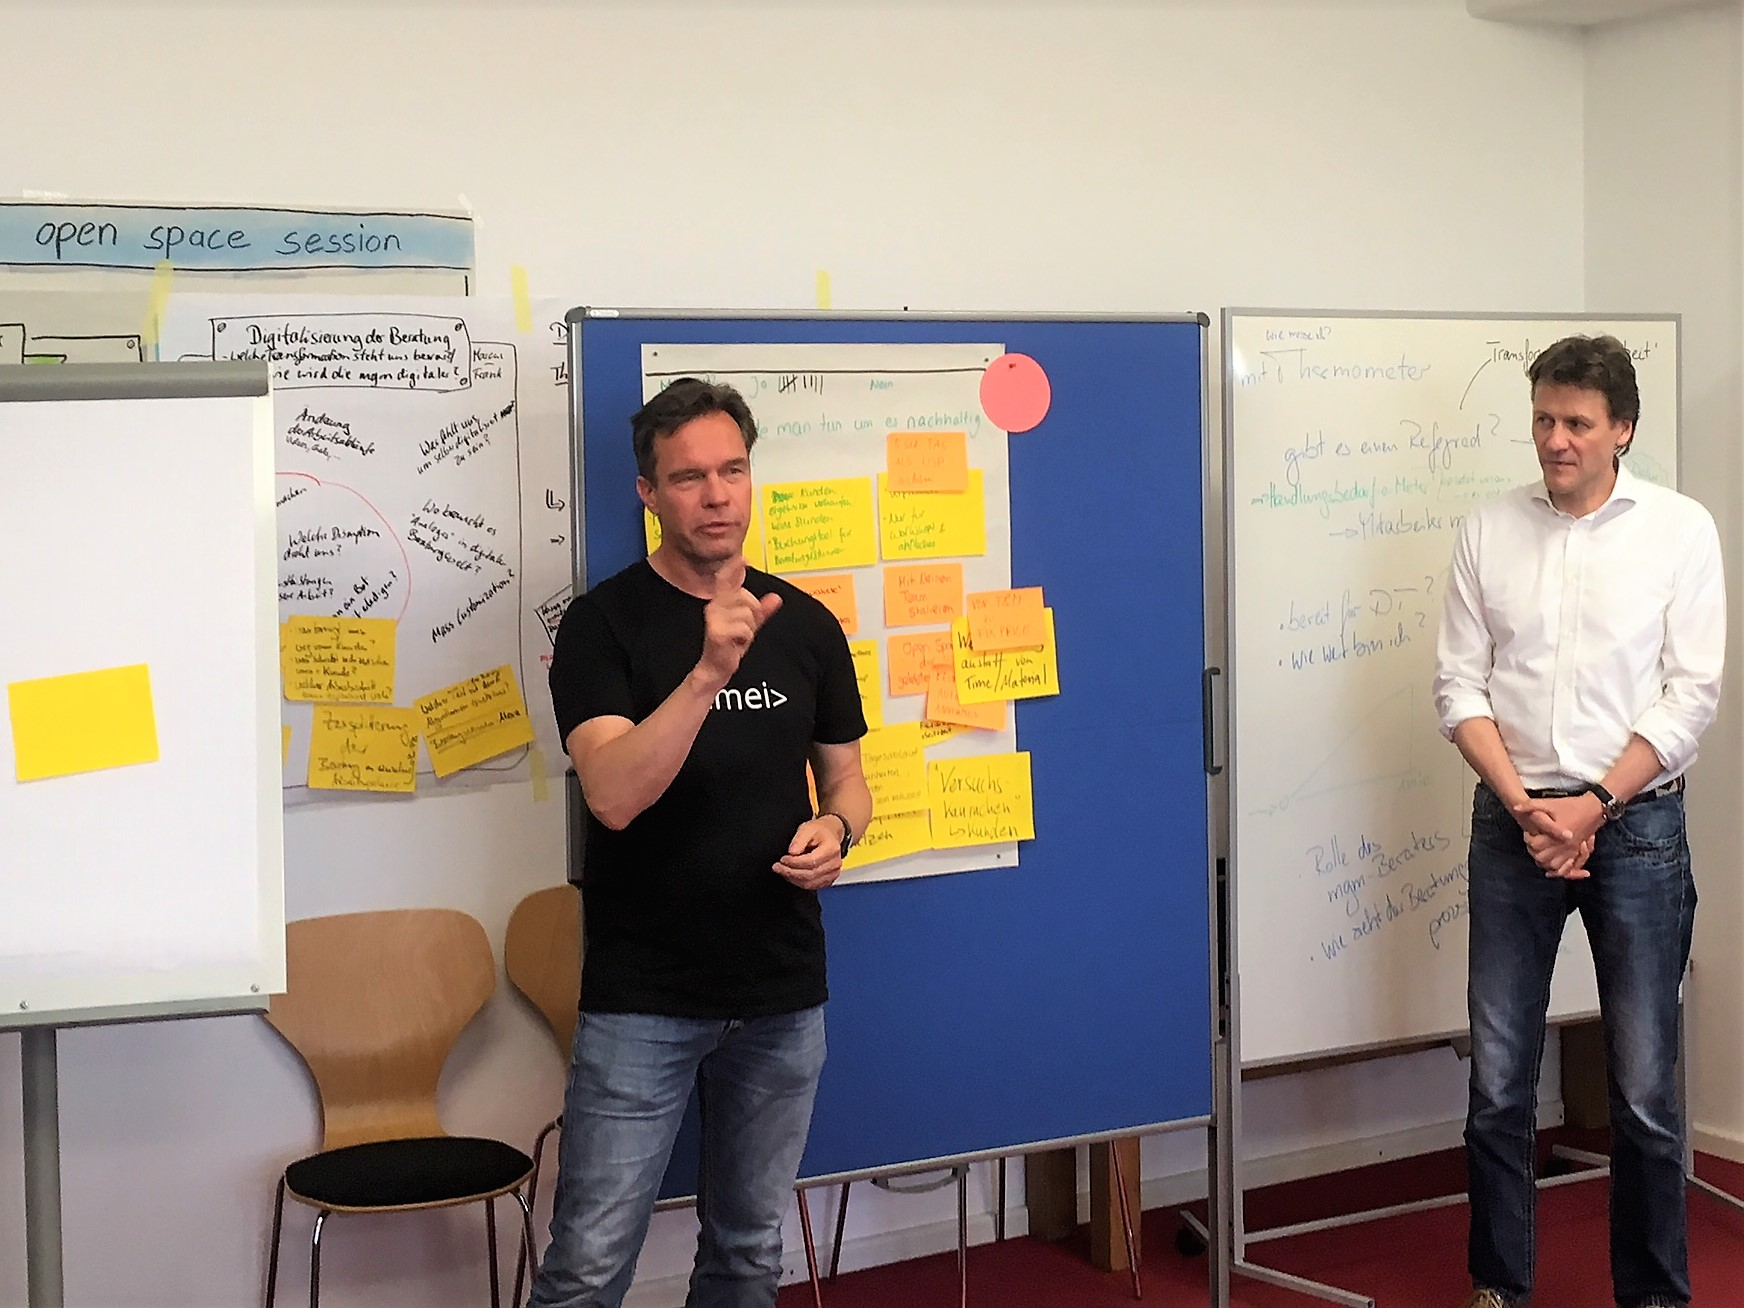 Thementag-Organisator Peter Schirmanski